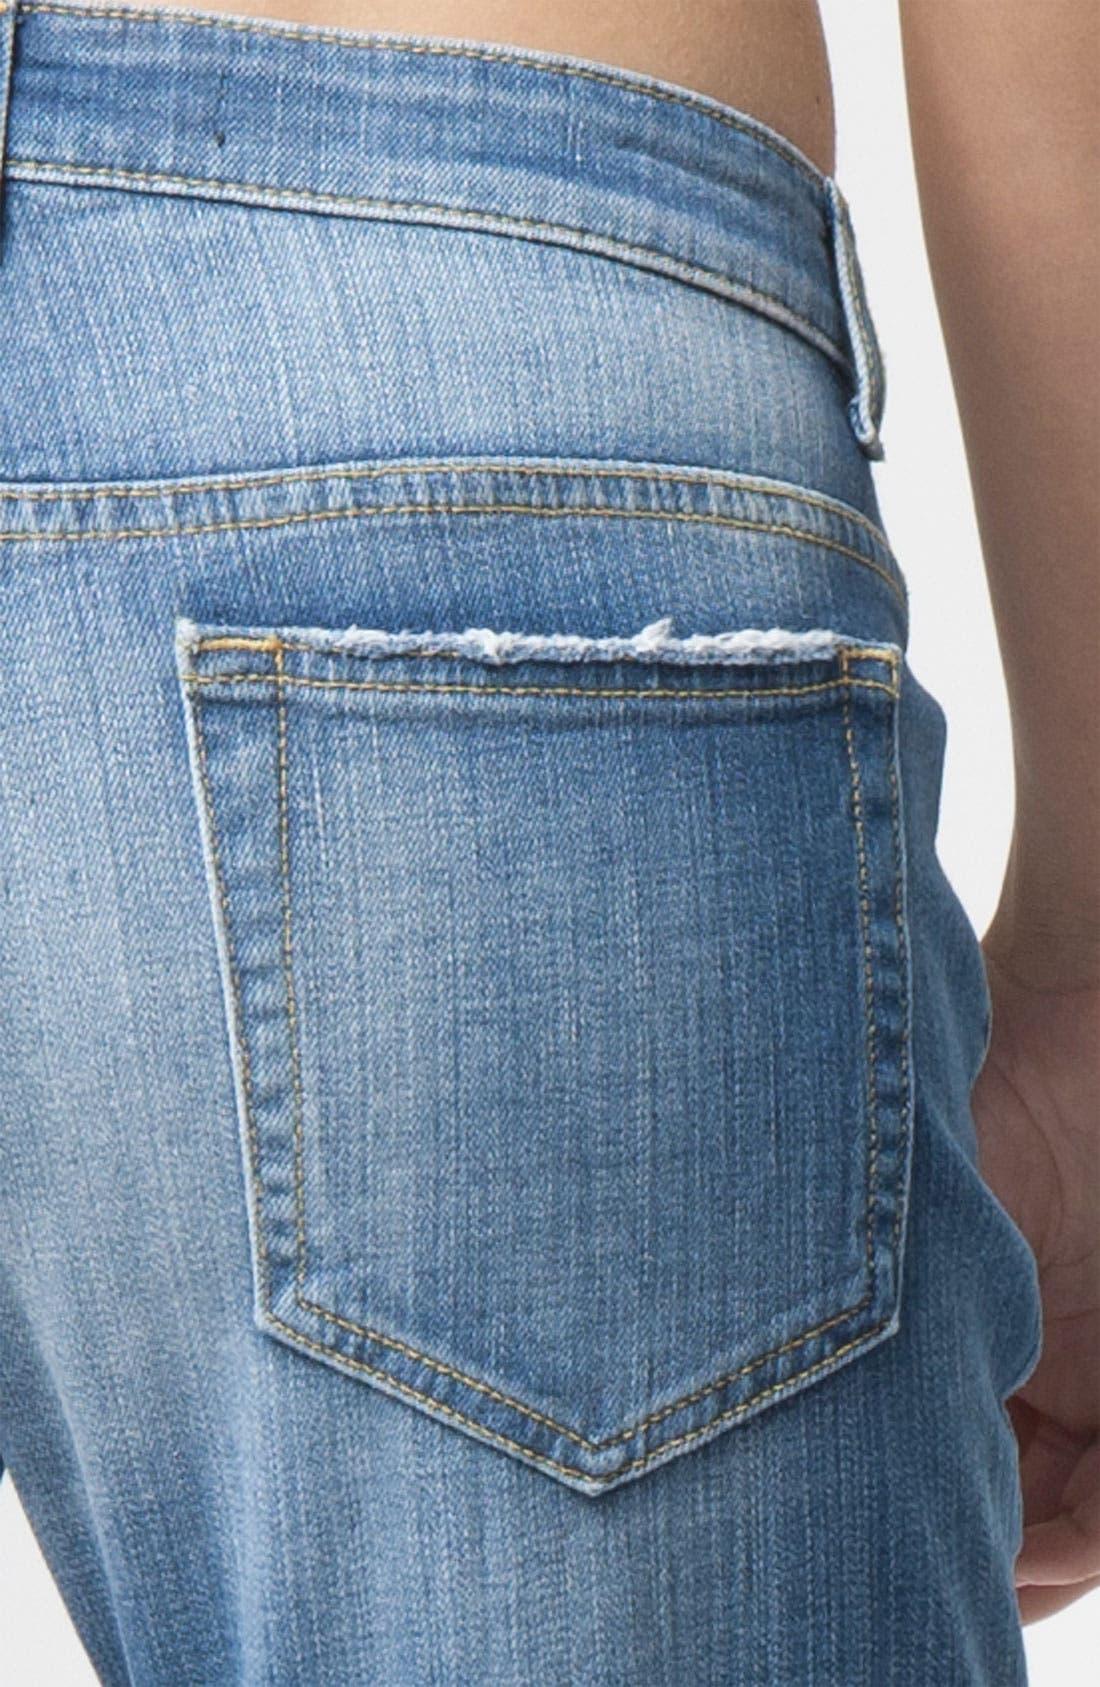 Alternate Image 3  - Joe's 'Easy Fit' Destroyed Crop Jeans (Penelope)